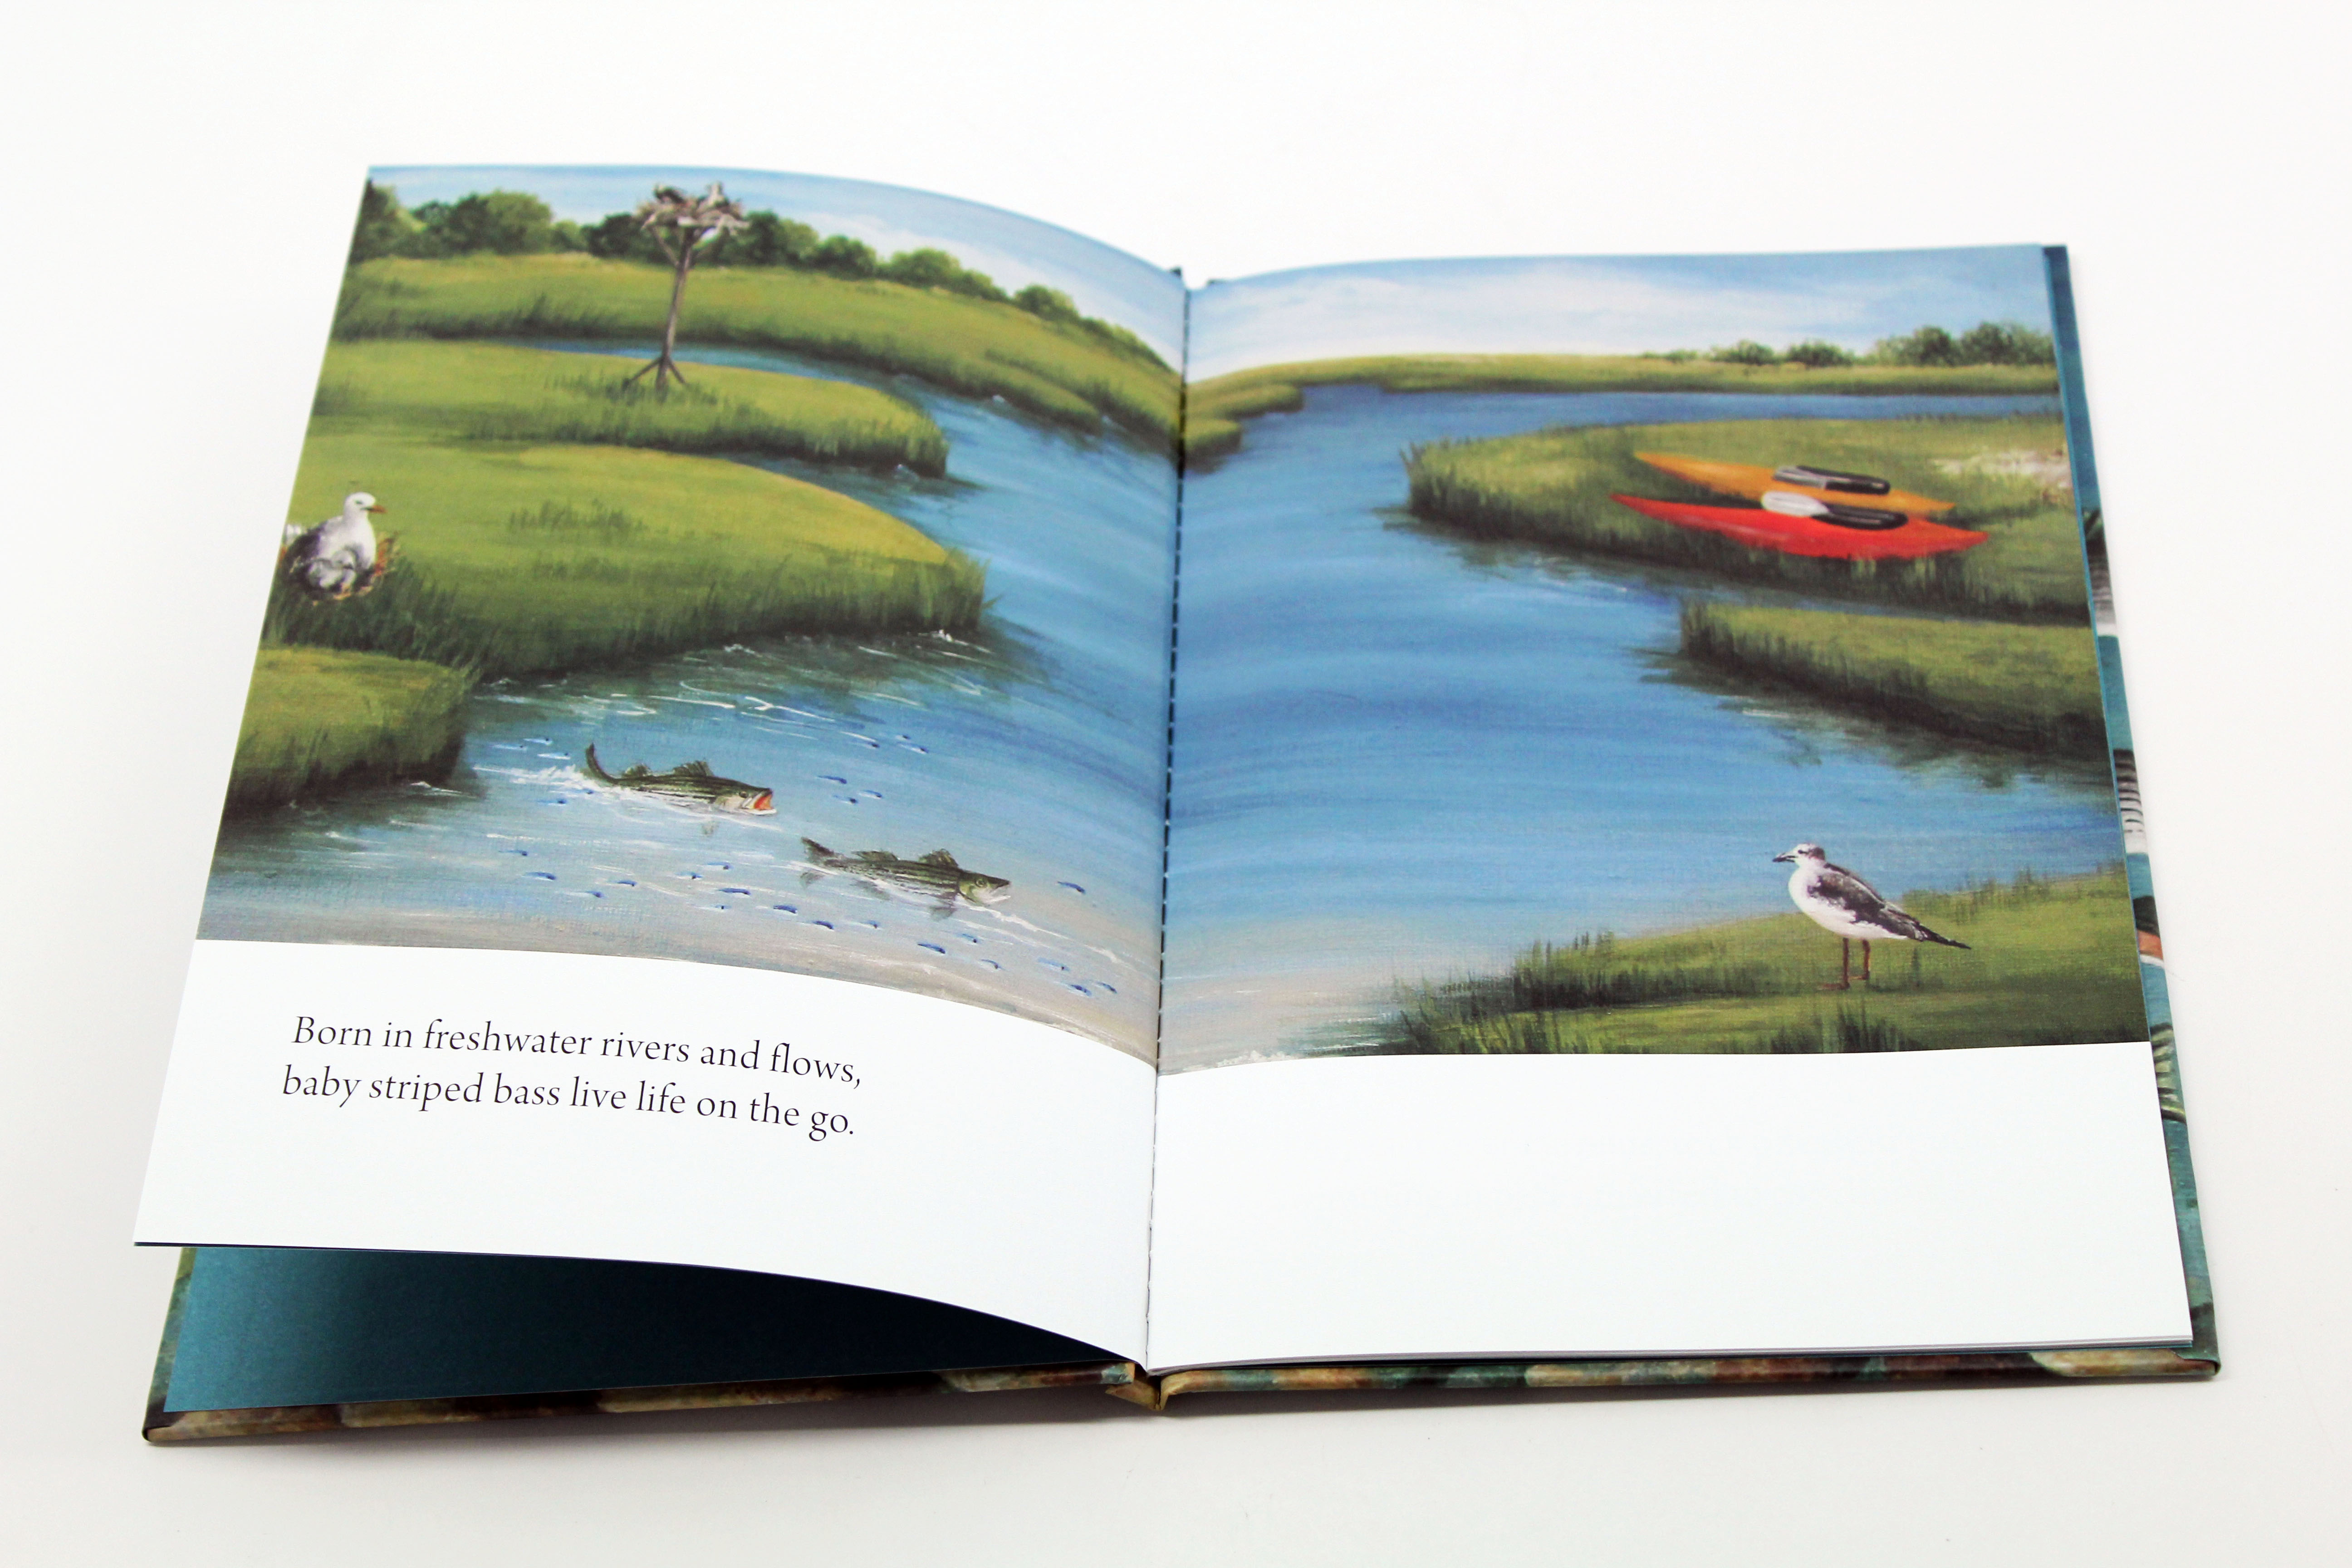 new children u0027s book explains striped bass migration educates next